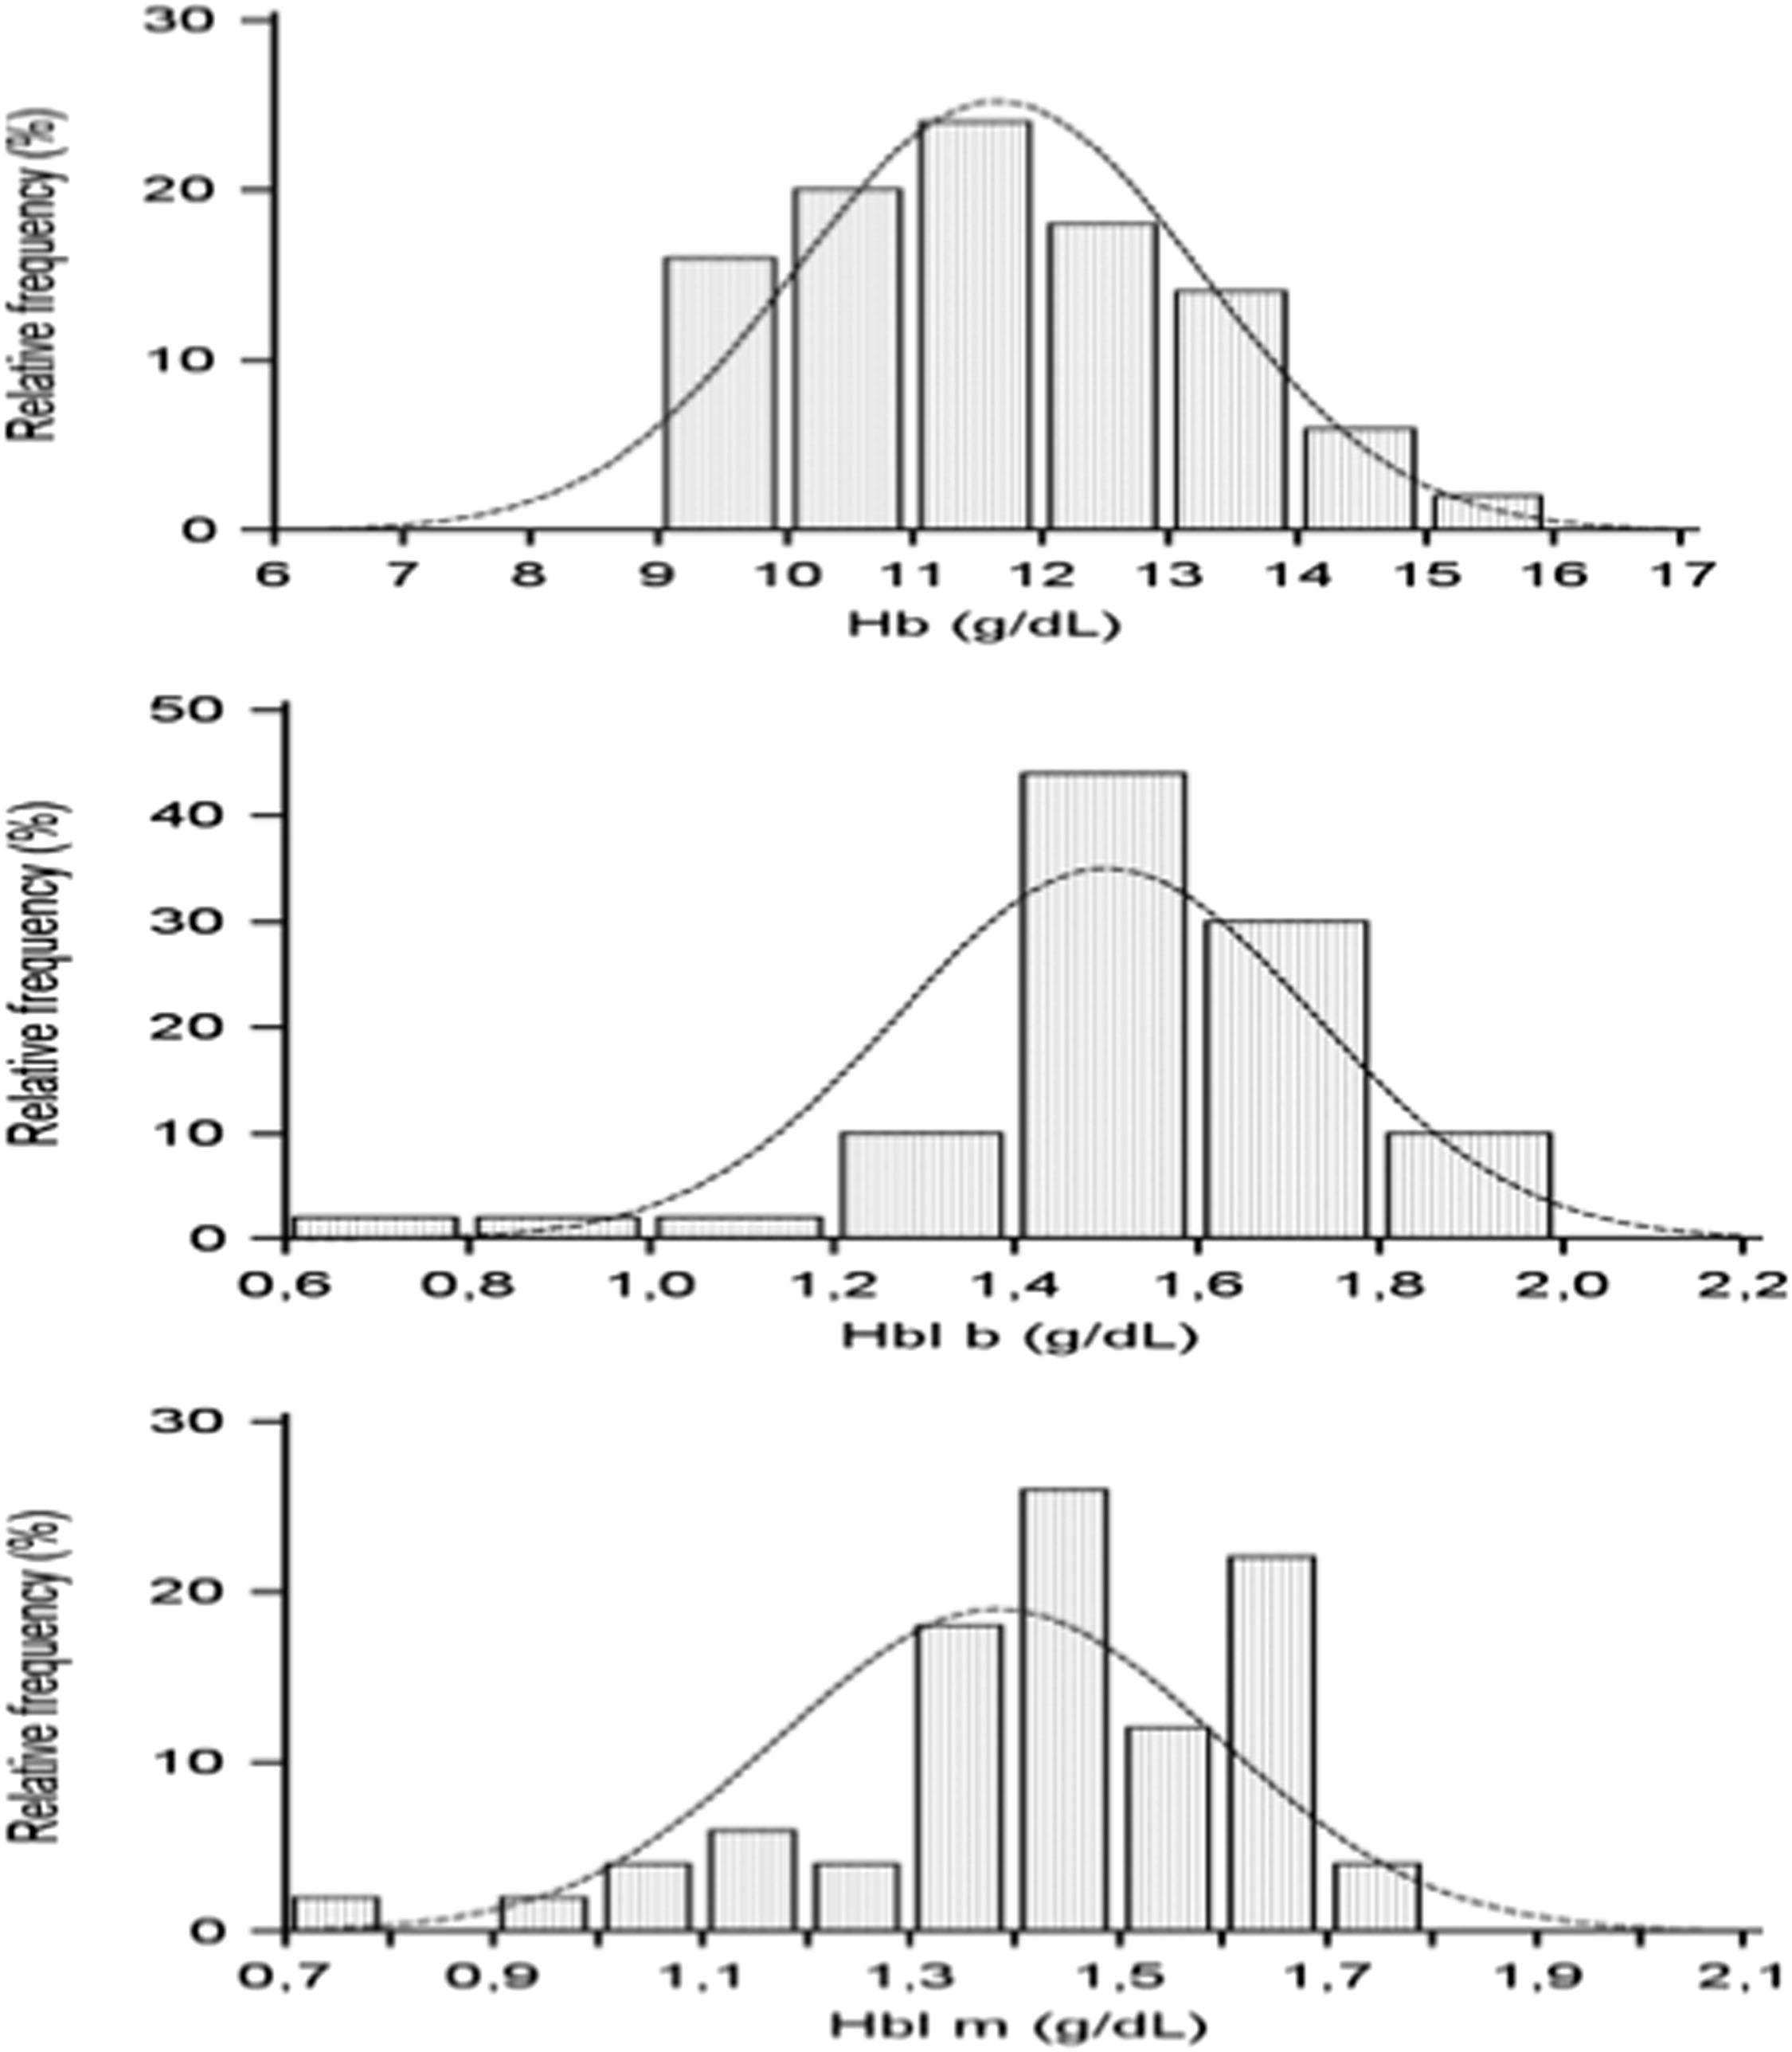 Near-Infrared Spectroscopy Hemoglobin Index Measurement